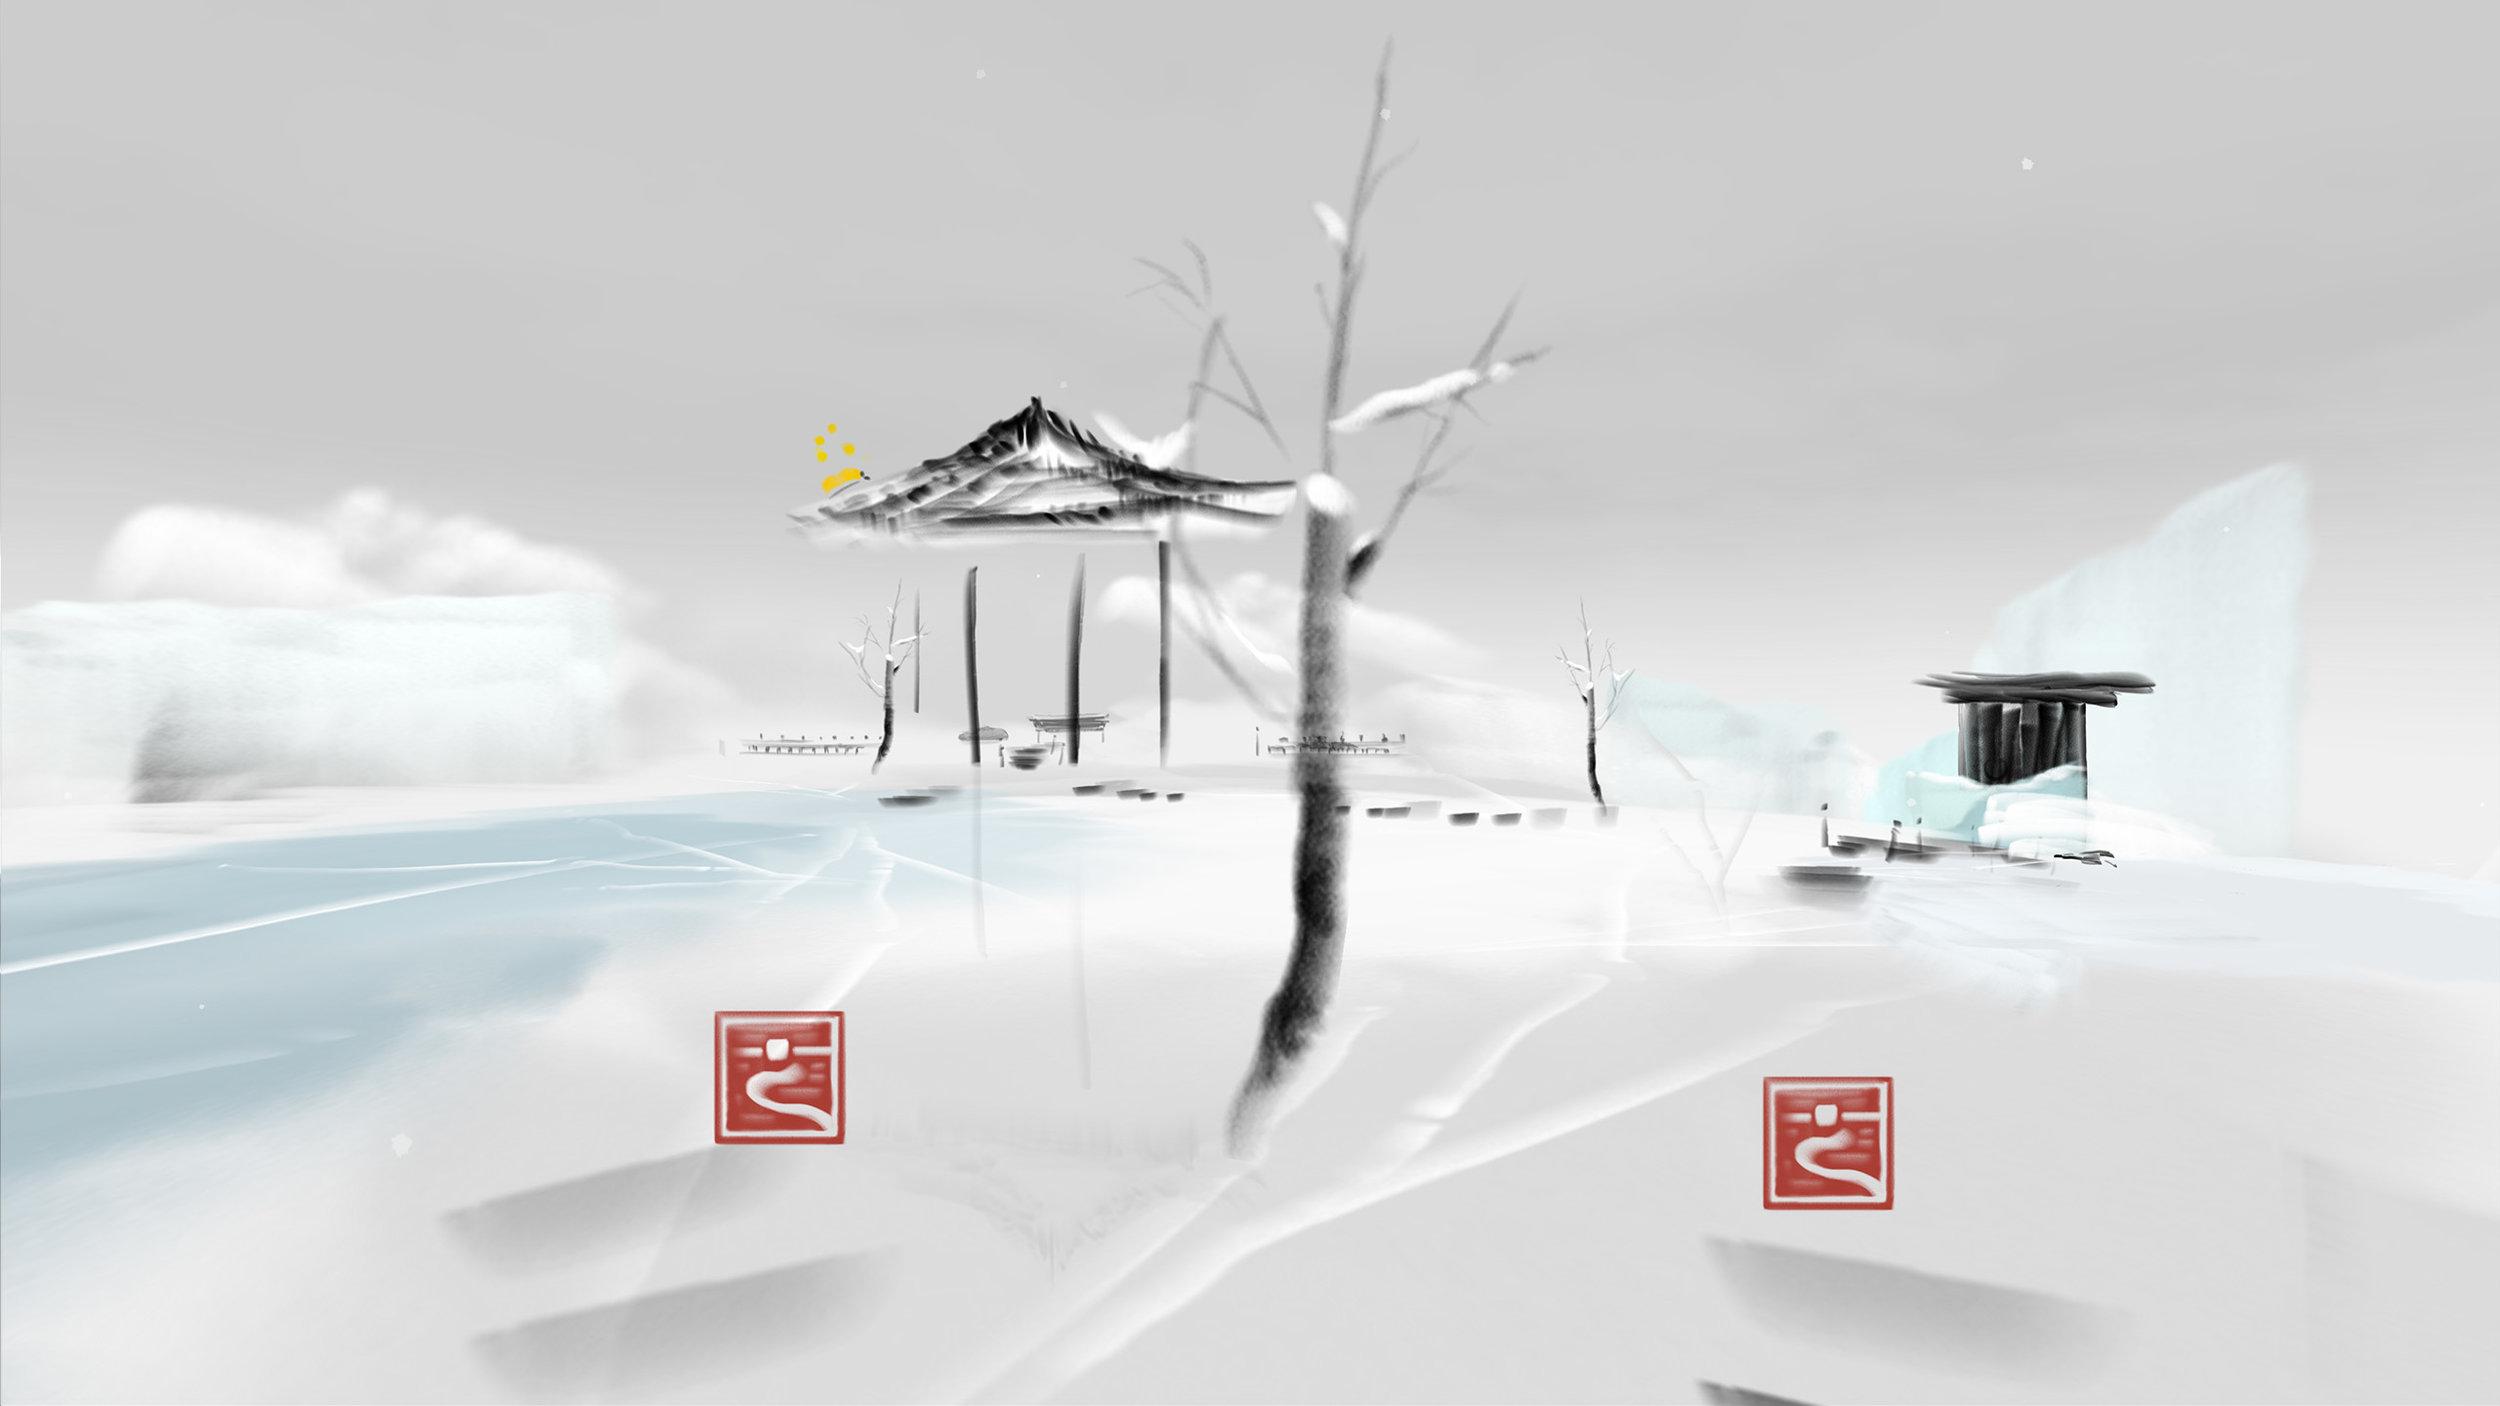 Mirages of Winter - The Lake - Screenshot 1440p.jpg